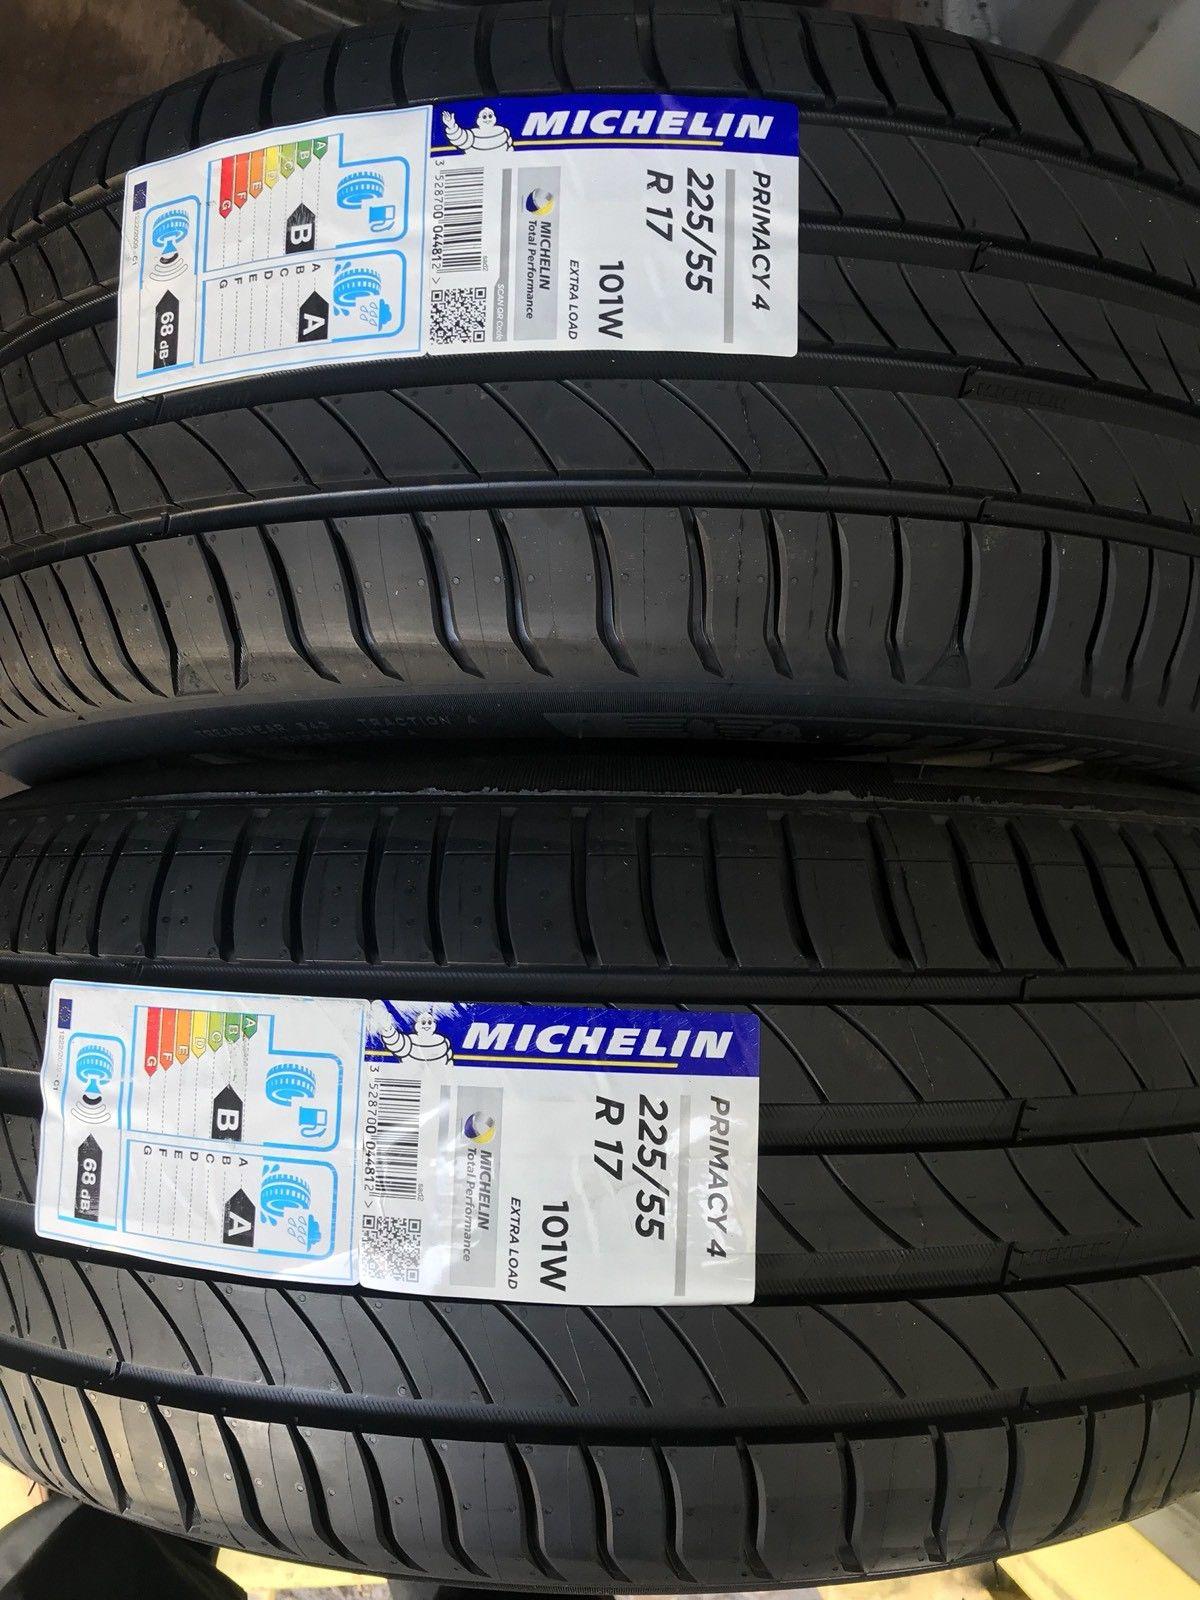 Cheap michelin tyres + even cheaper on a Monday @ ATS Euromaster